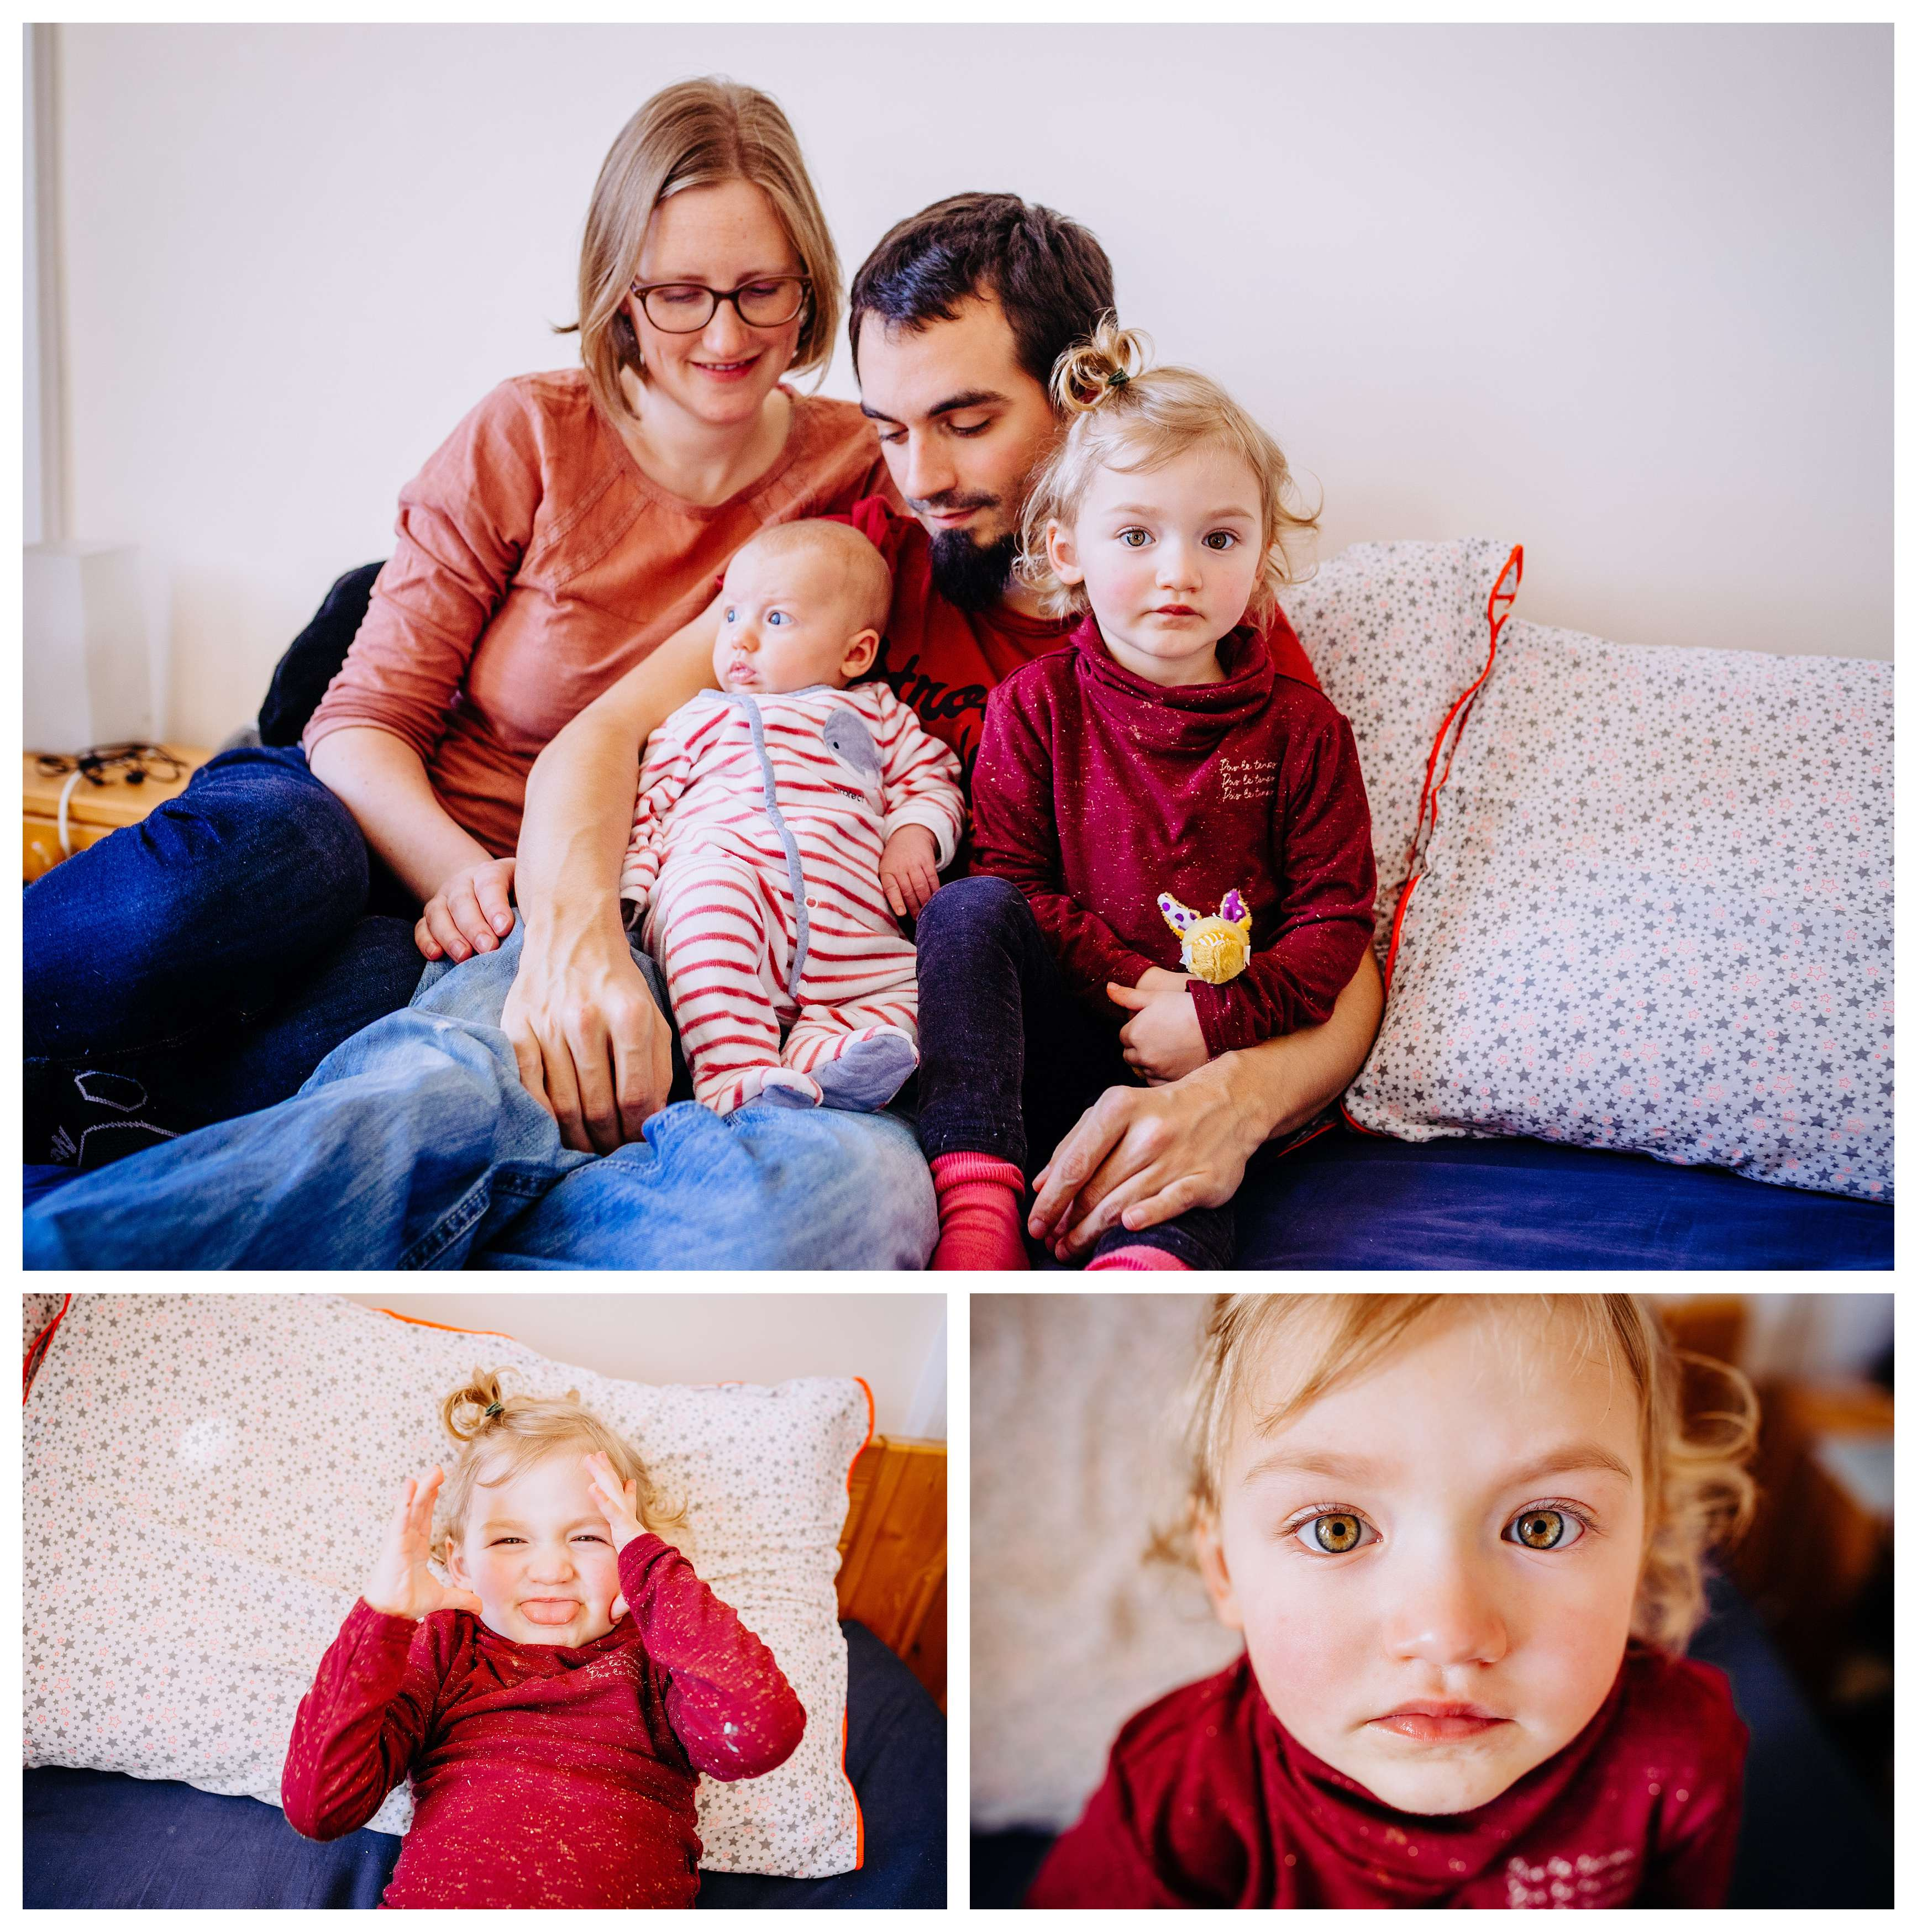 seance famille naissance